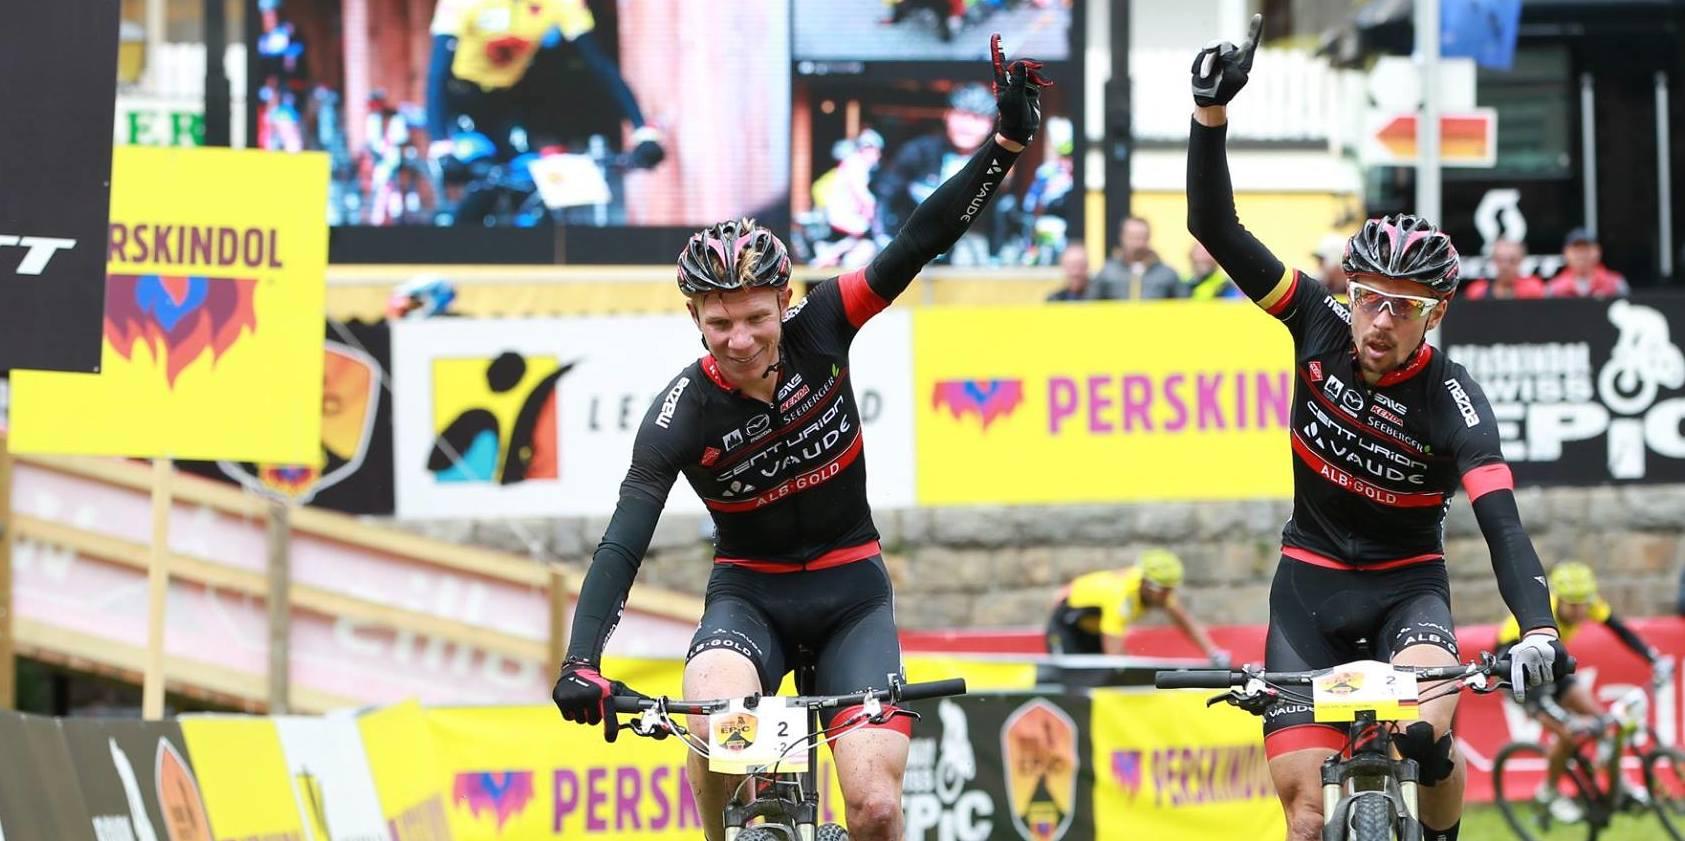 Geismayr_Kaess_SwissEpic15_Etappe1_winning.j